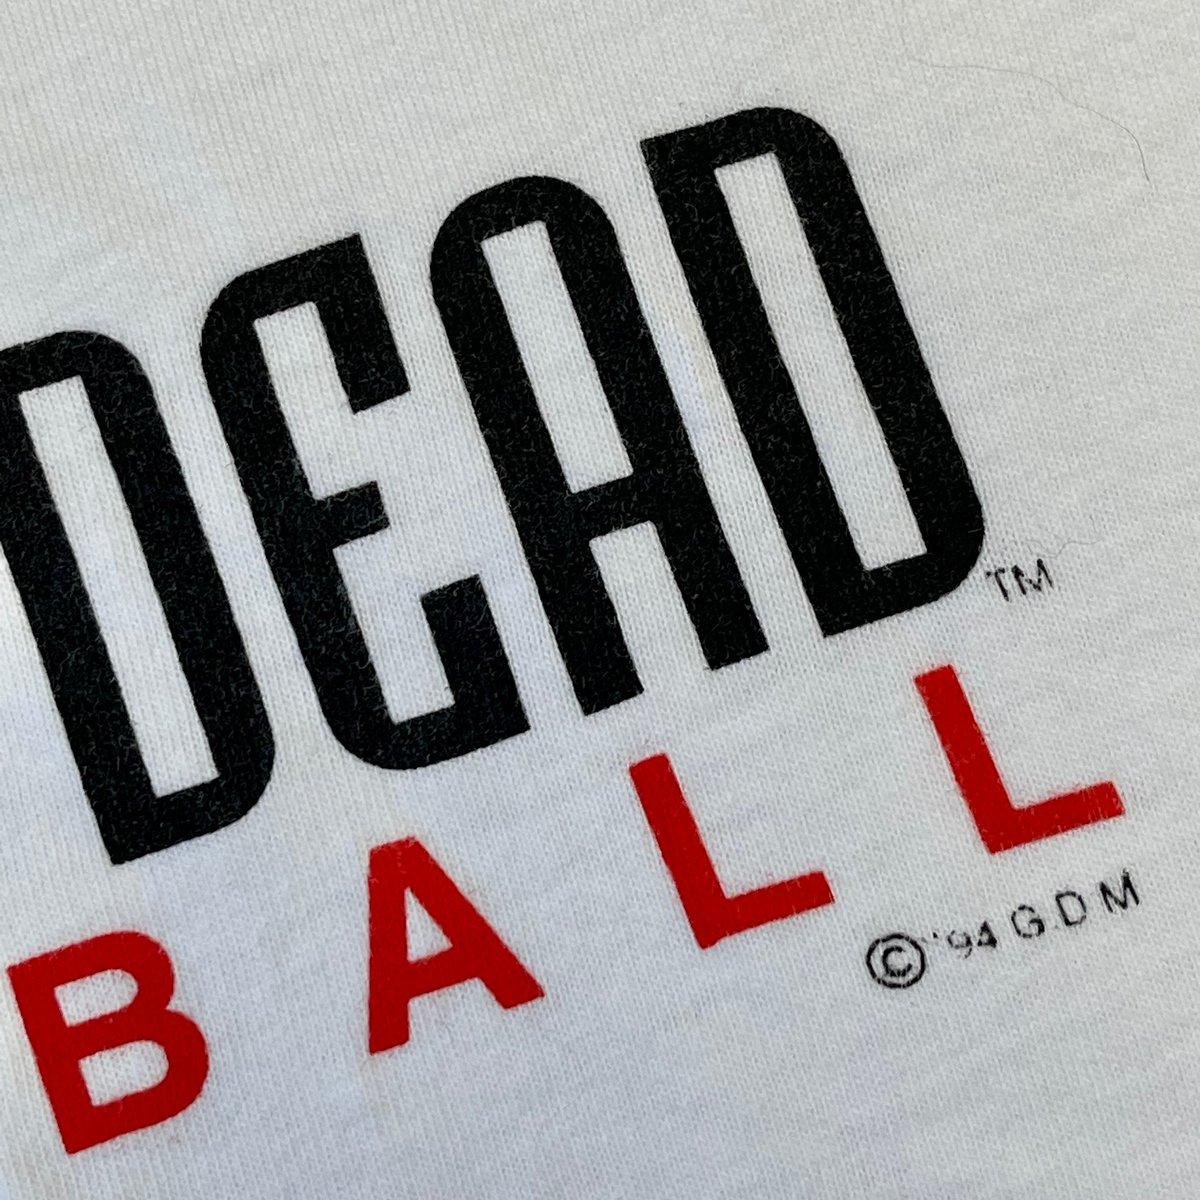 Original Vintage Grateful Dead Basketball 1994 Short Sleeve Tee! - X-LARGE